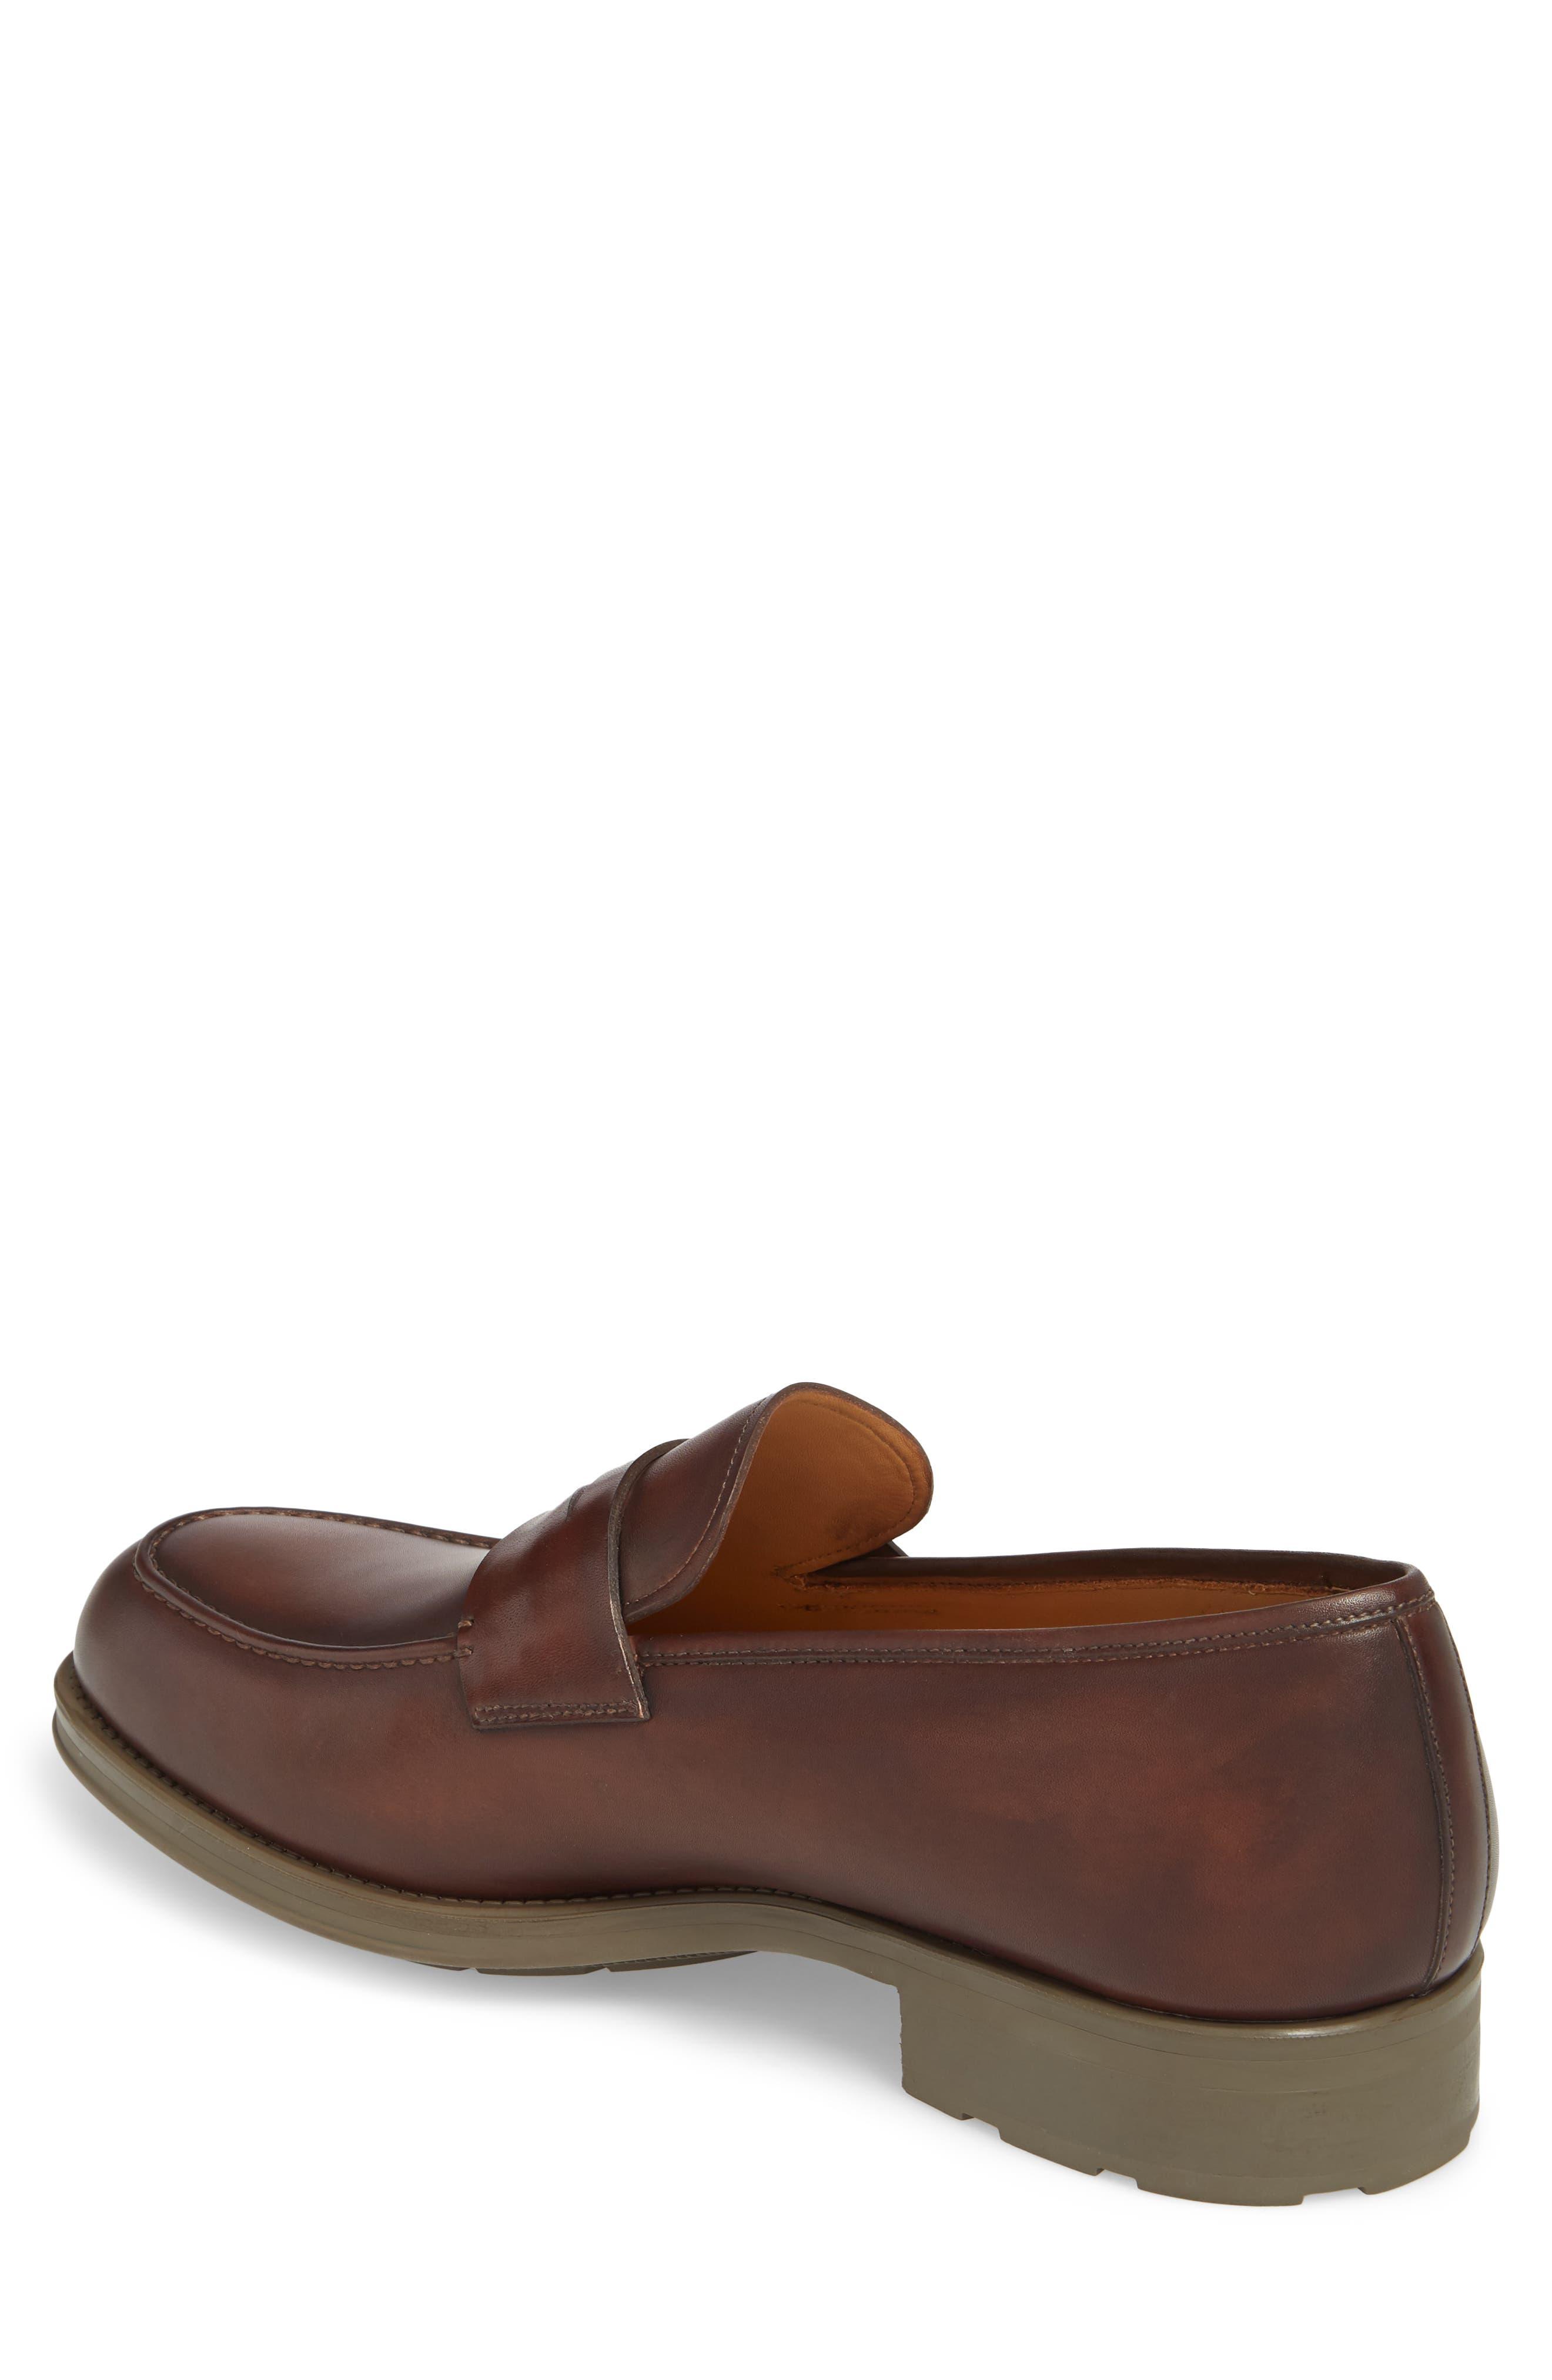 Bernardo Penny Loafer,                             Alternate thumbnail 2, color,                             Brown Leather